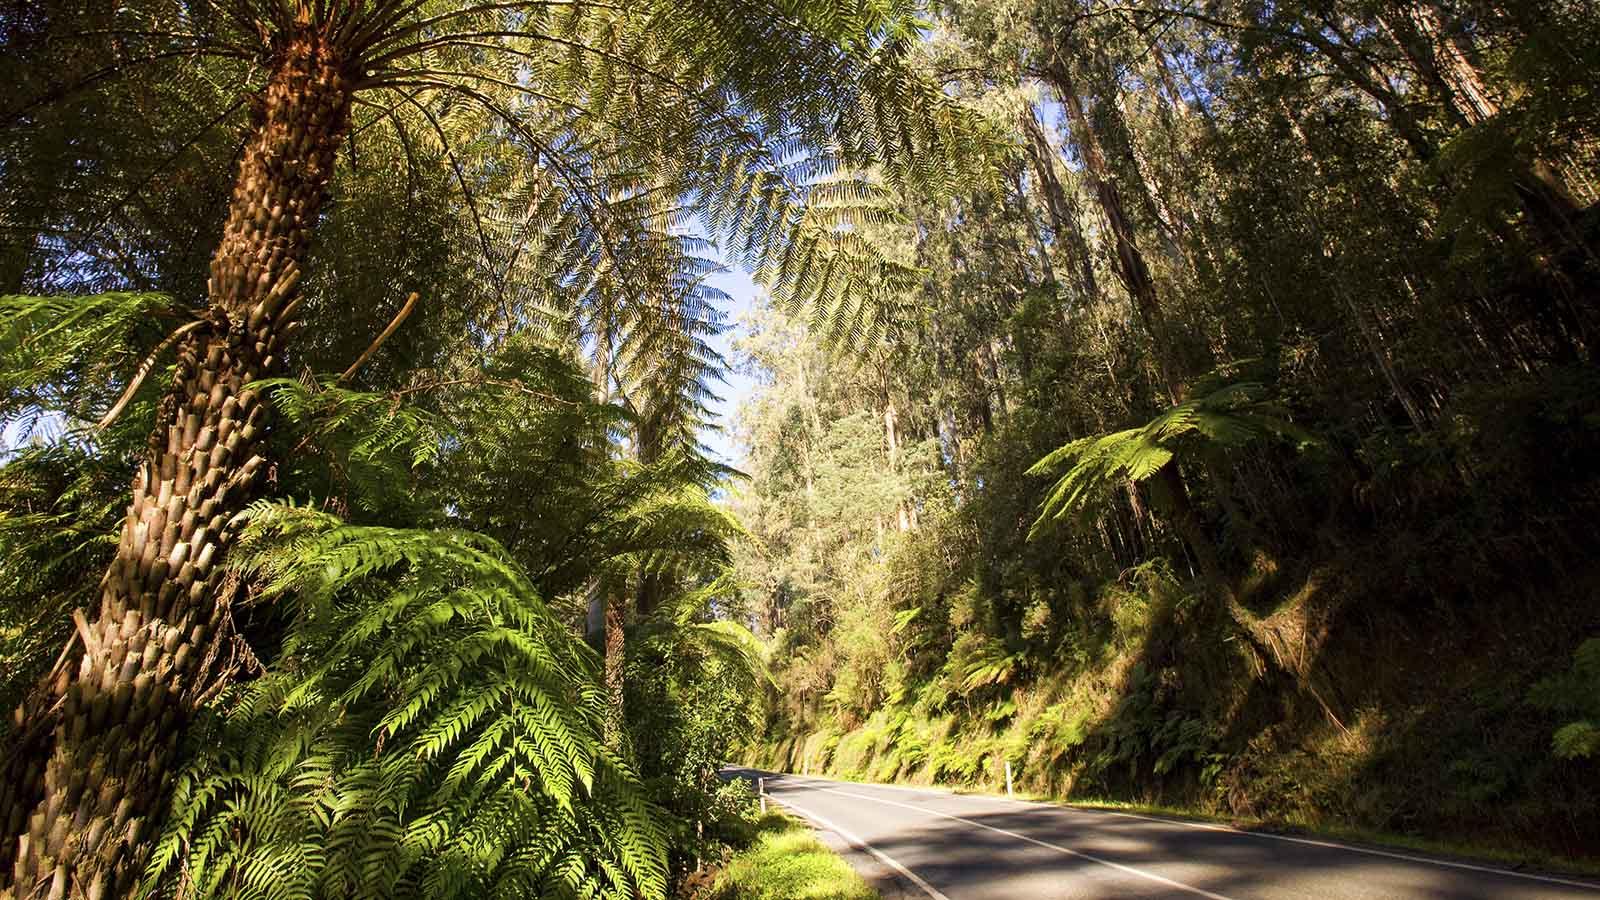 West Gippsland Hinterland Drive, Gippsland Victoria, Australia